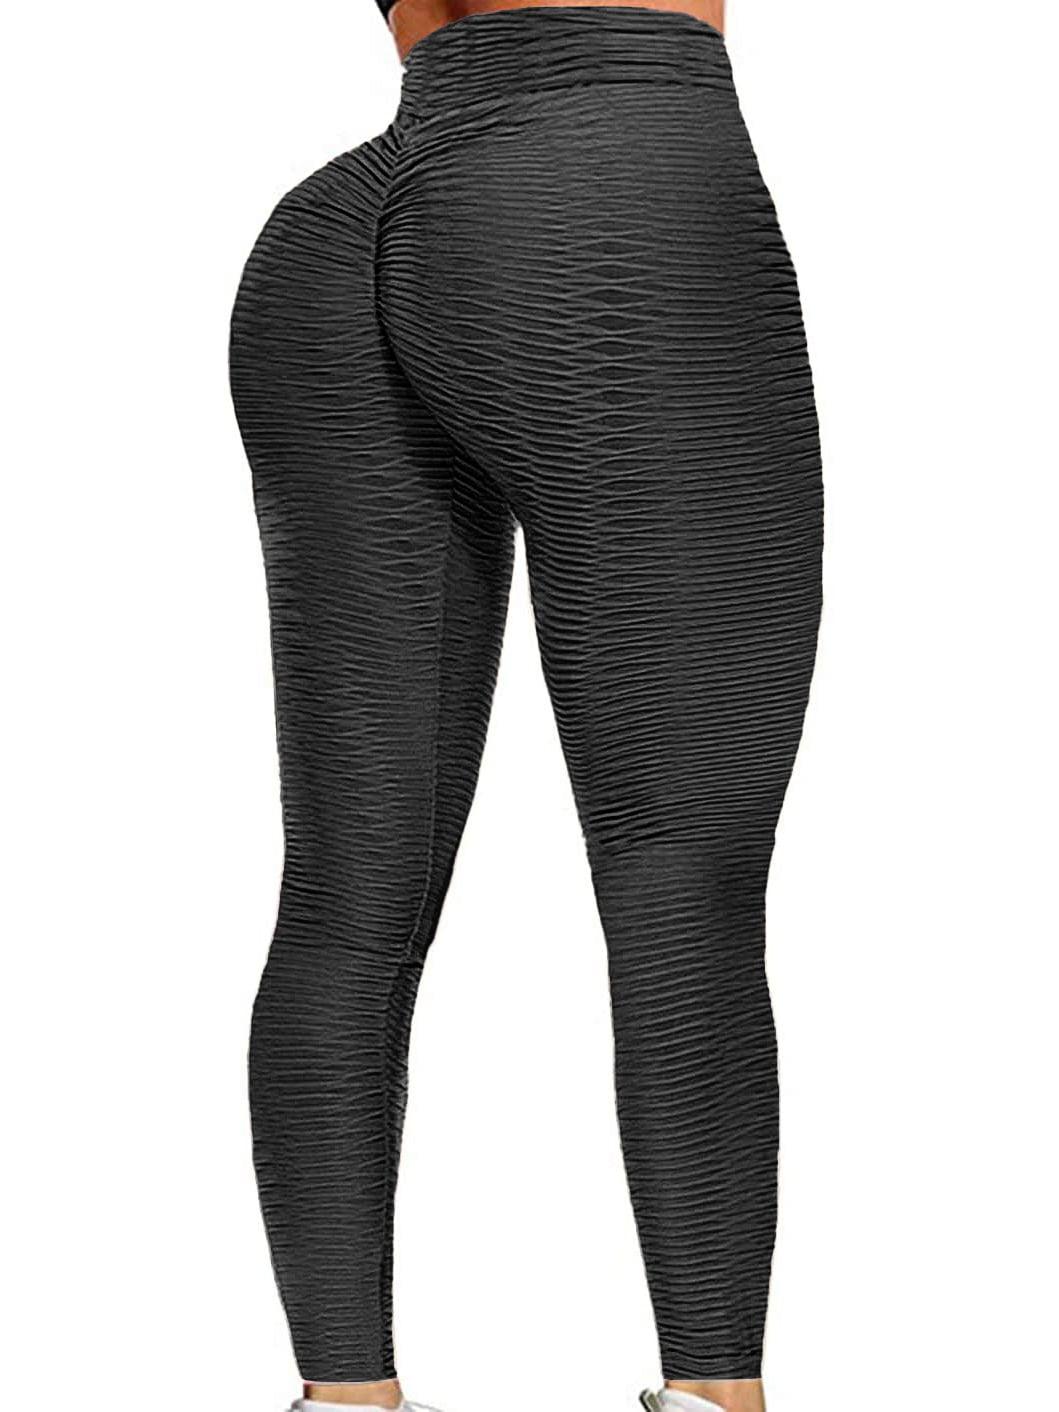 Yoga Shorts for Women High Waist,Womens Biker Shorts Ruched Butt Lift Leggings Tummy Control Workout Tights